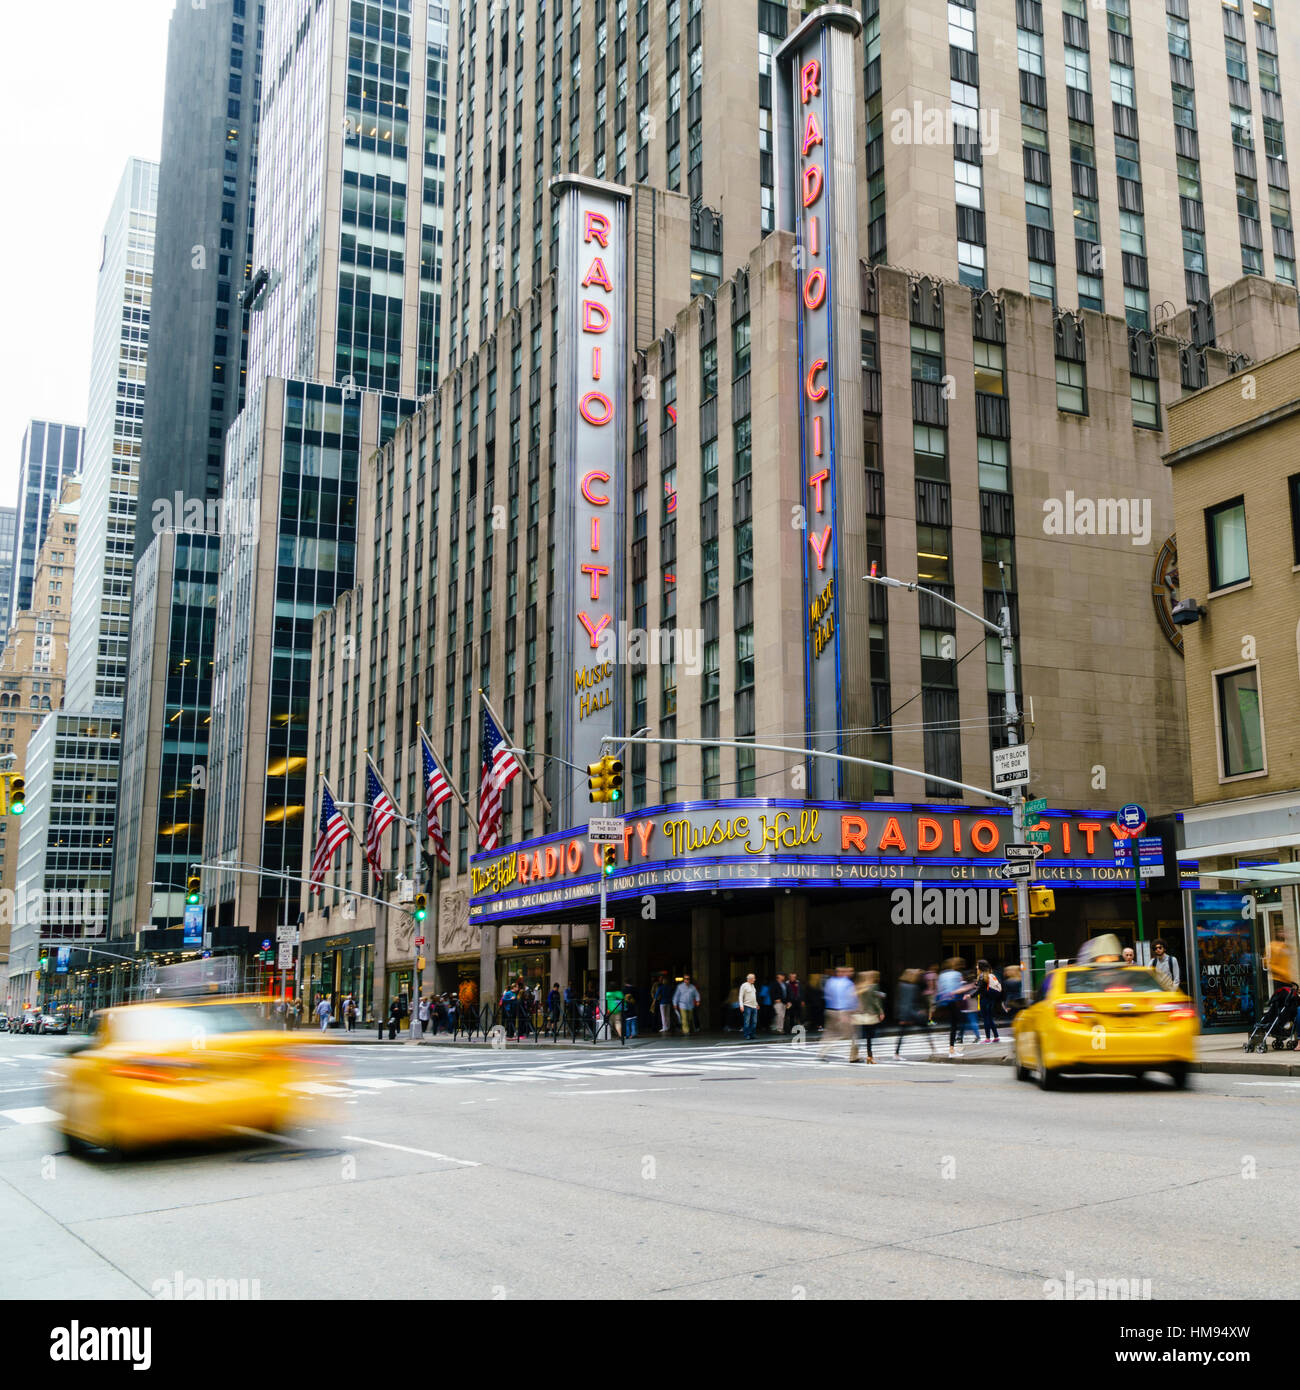 Radio City Music Hall, Manhattan, New York City, United States of America, North America - Stock Image